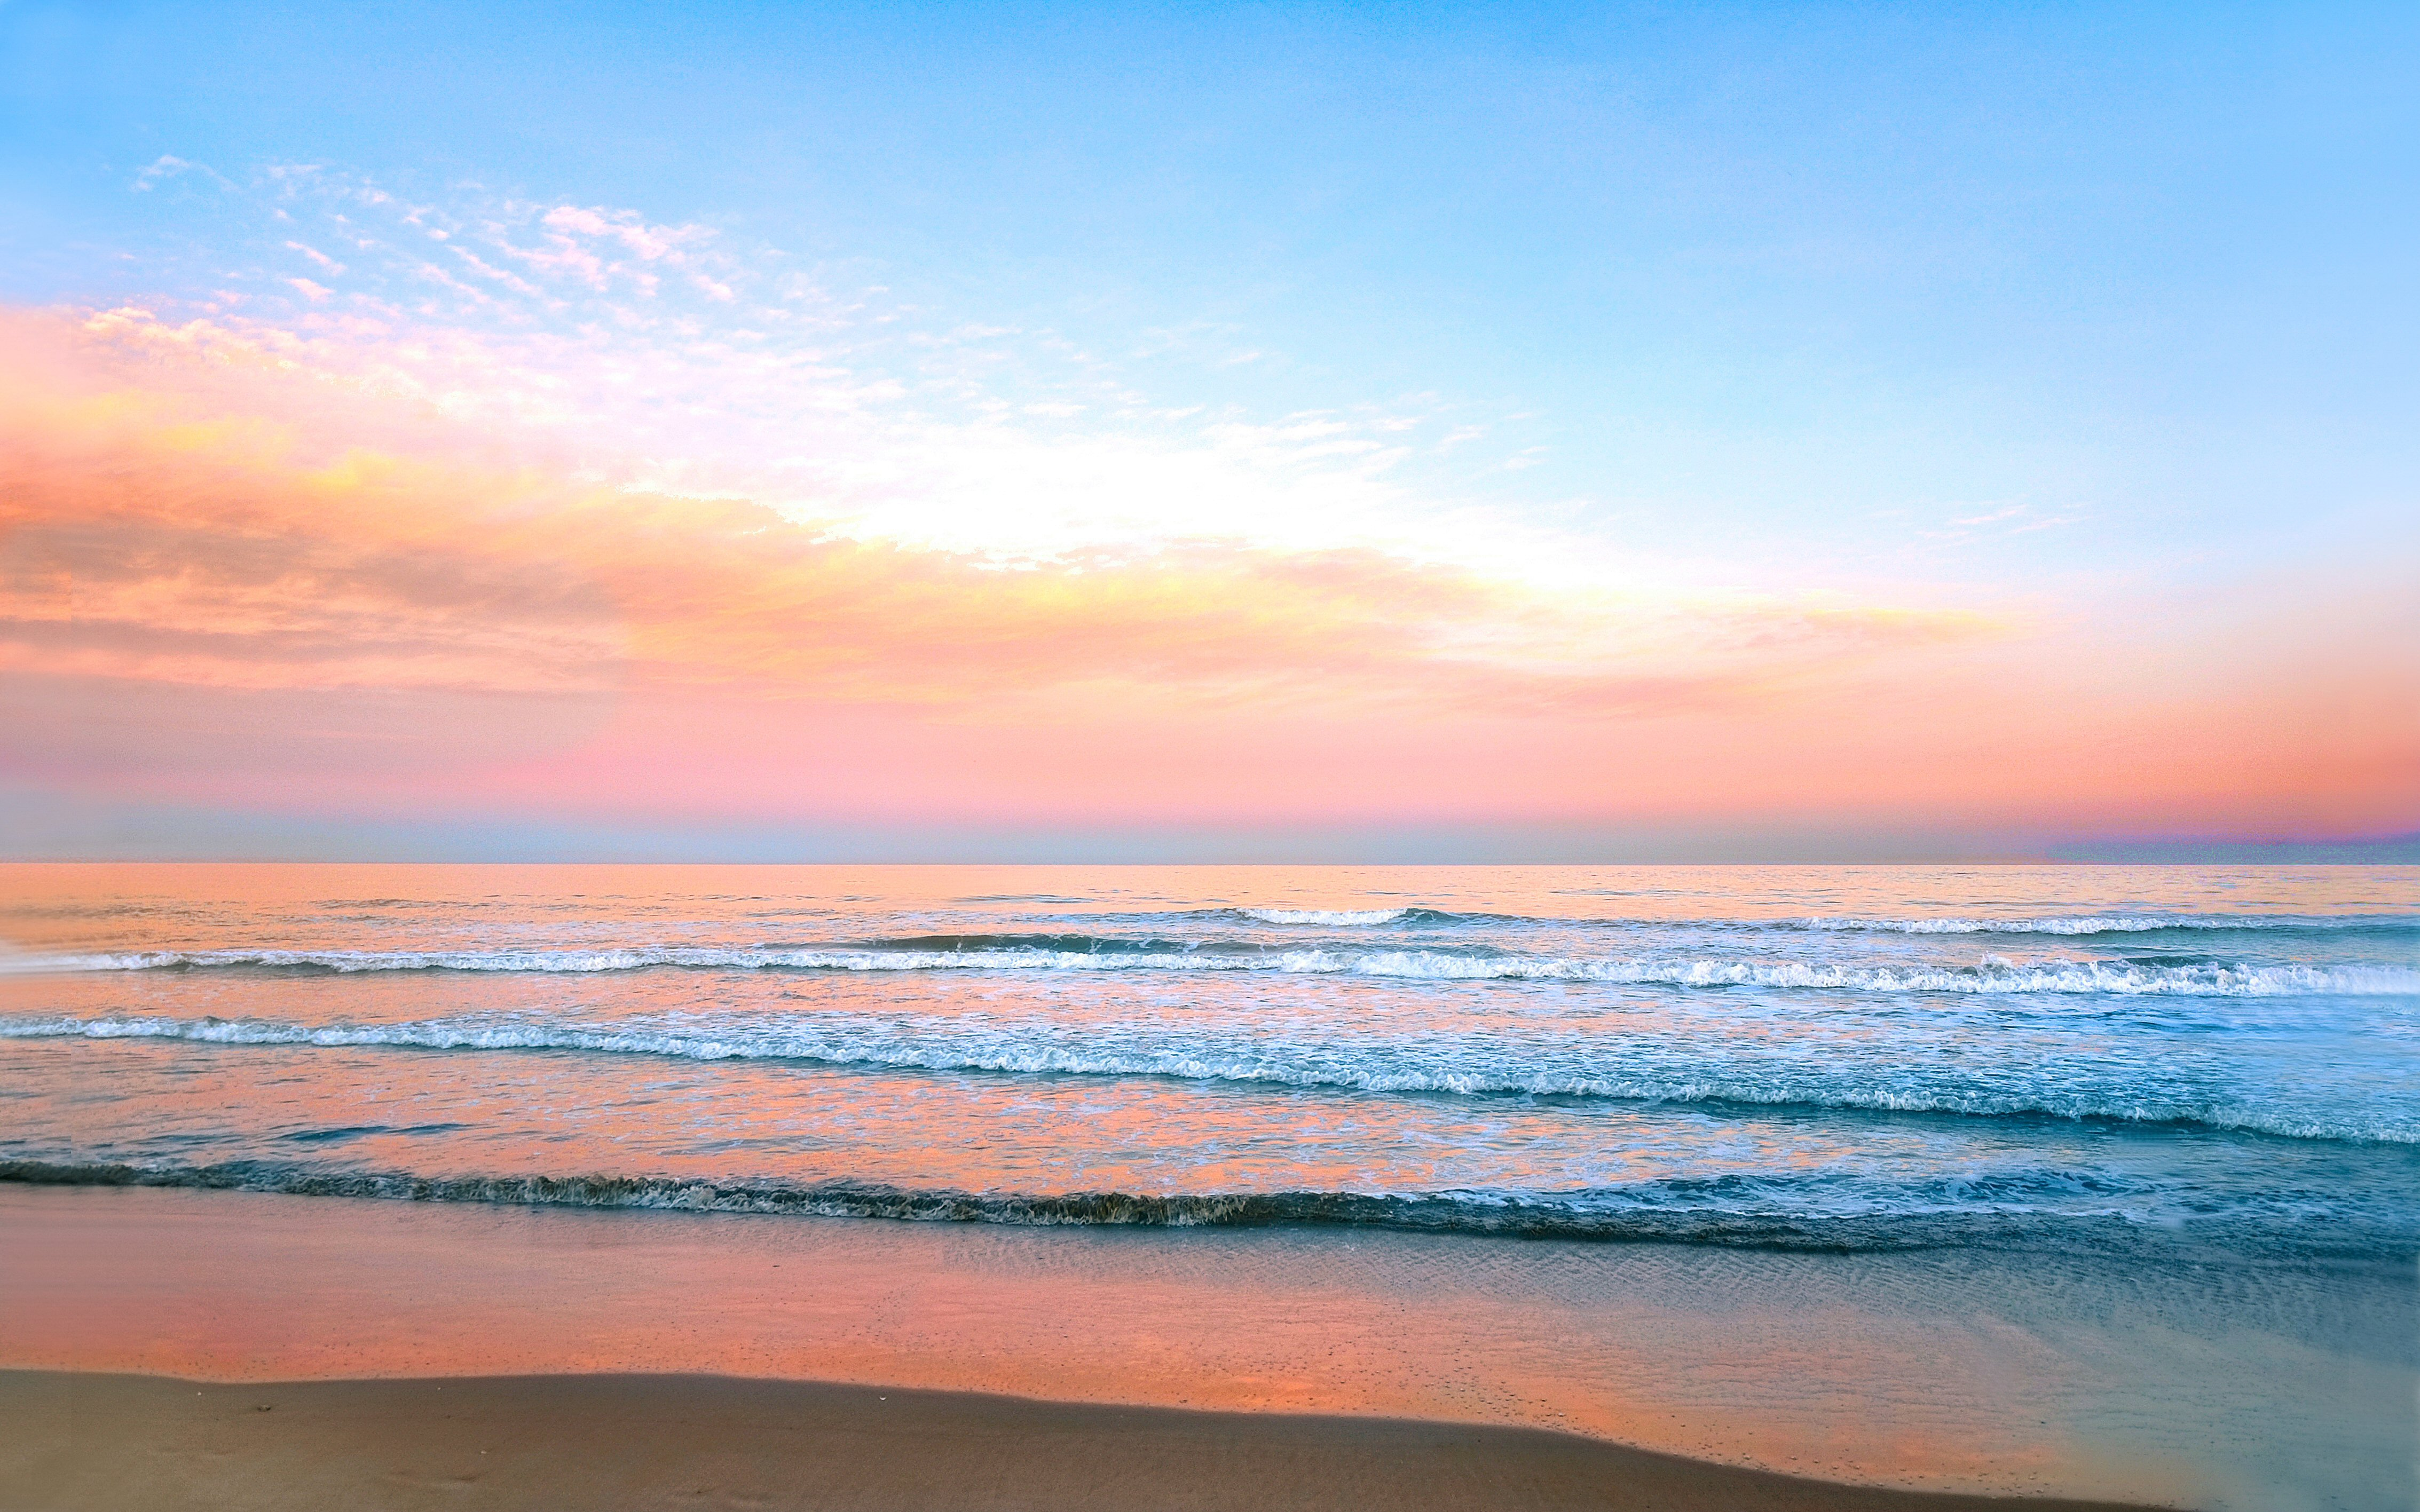 sky sea beaches - photo #12